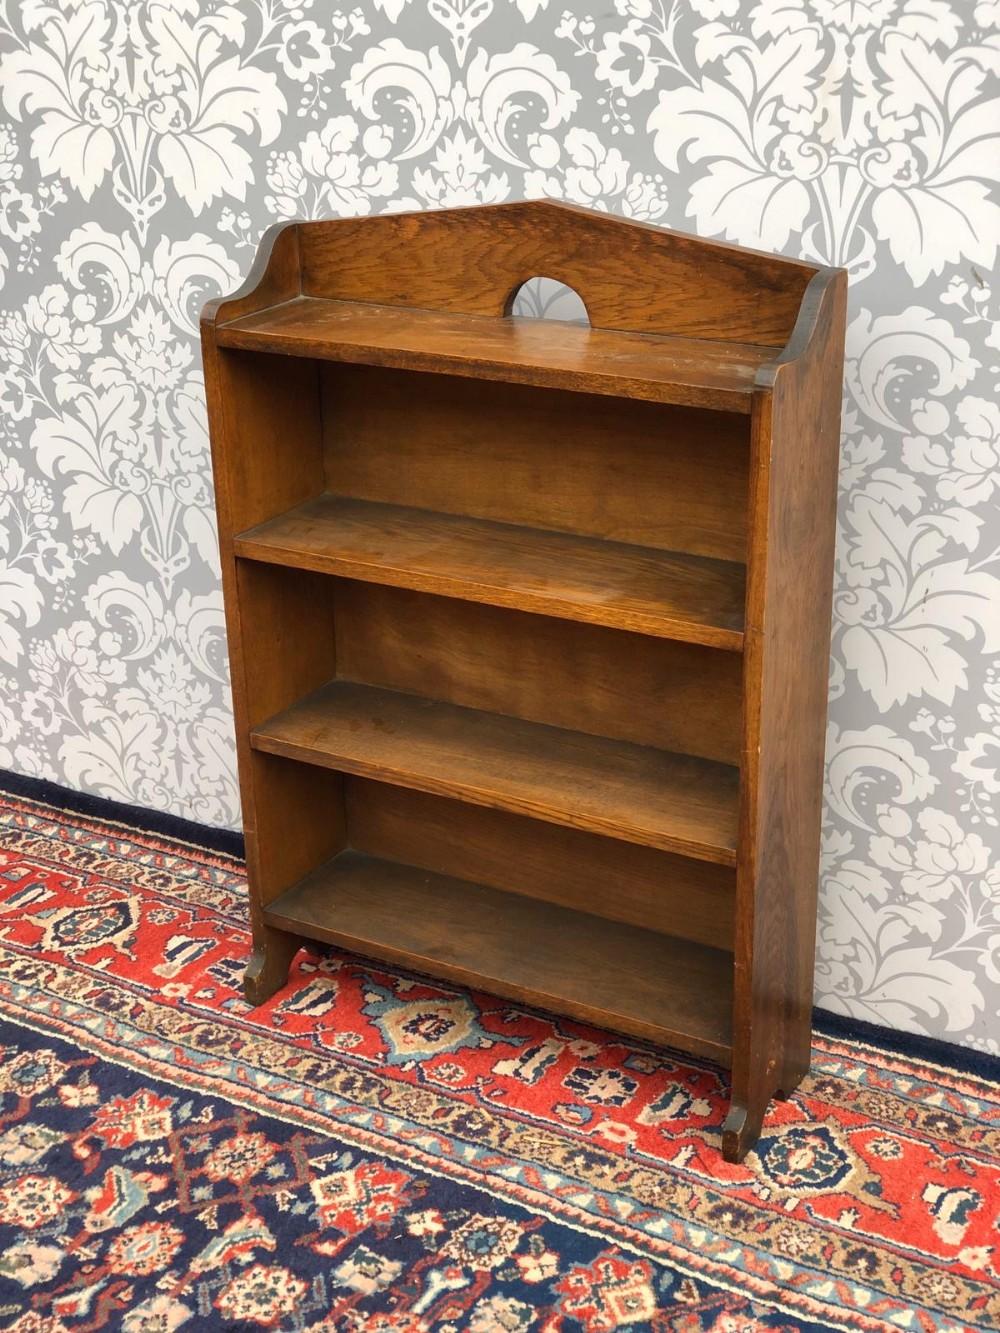 1920s Arts And Crafts Solid Oak Bookcase Original 668438